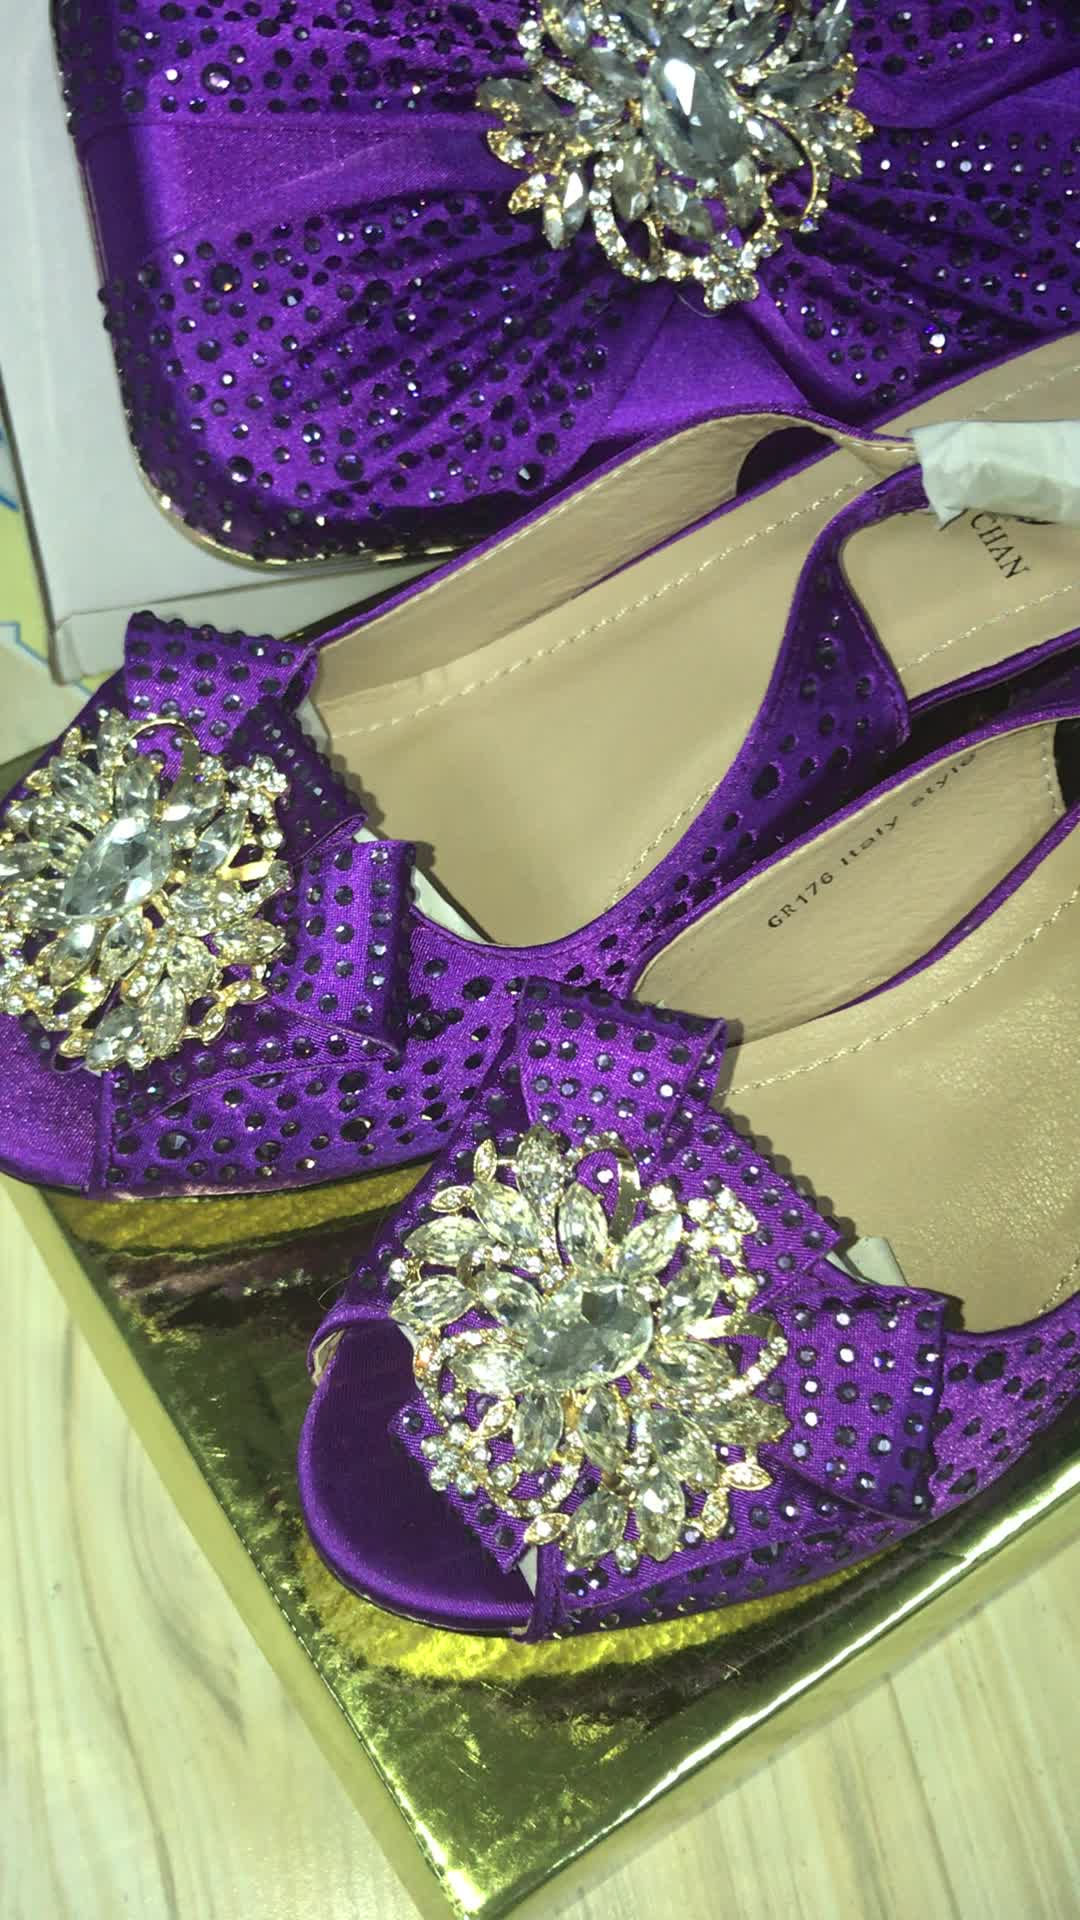 ZR1819 Guangzhou Pasar Tas/Italia Sepatu Yang Sesuai dengan Tas Wanita Heels-Sepatu